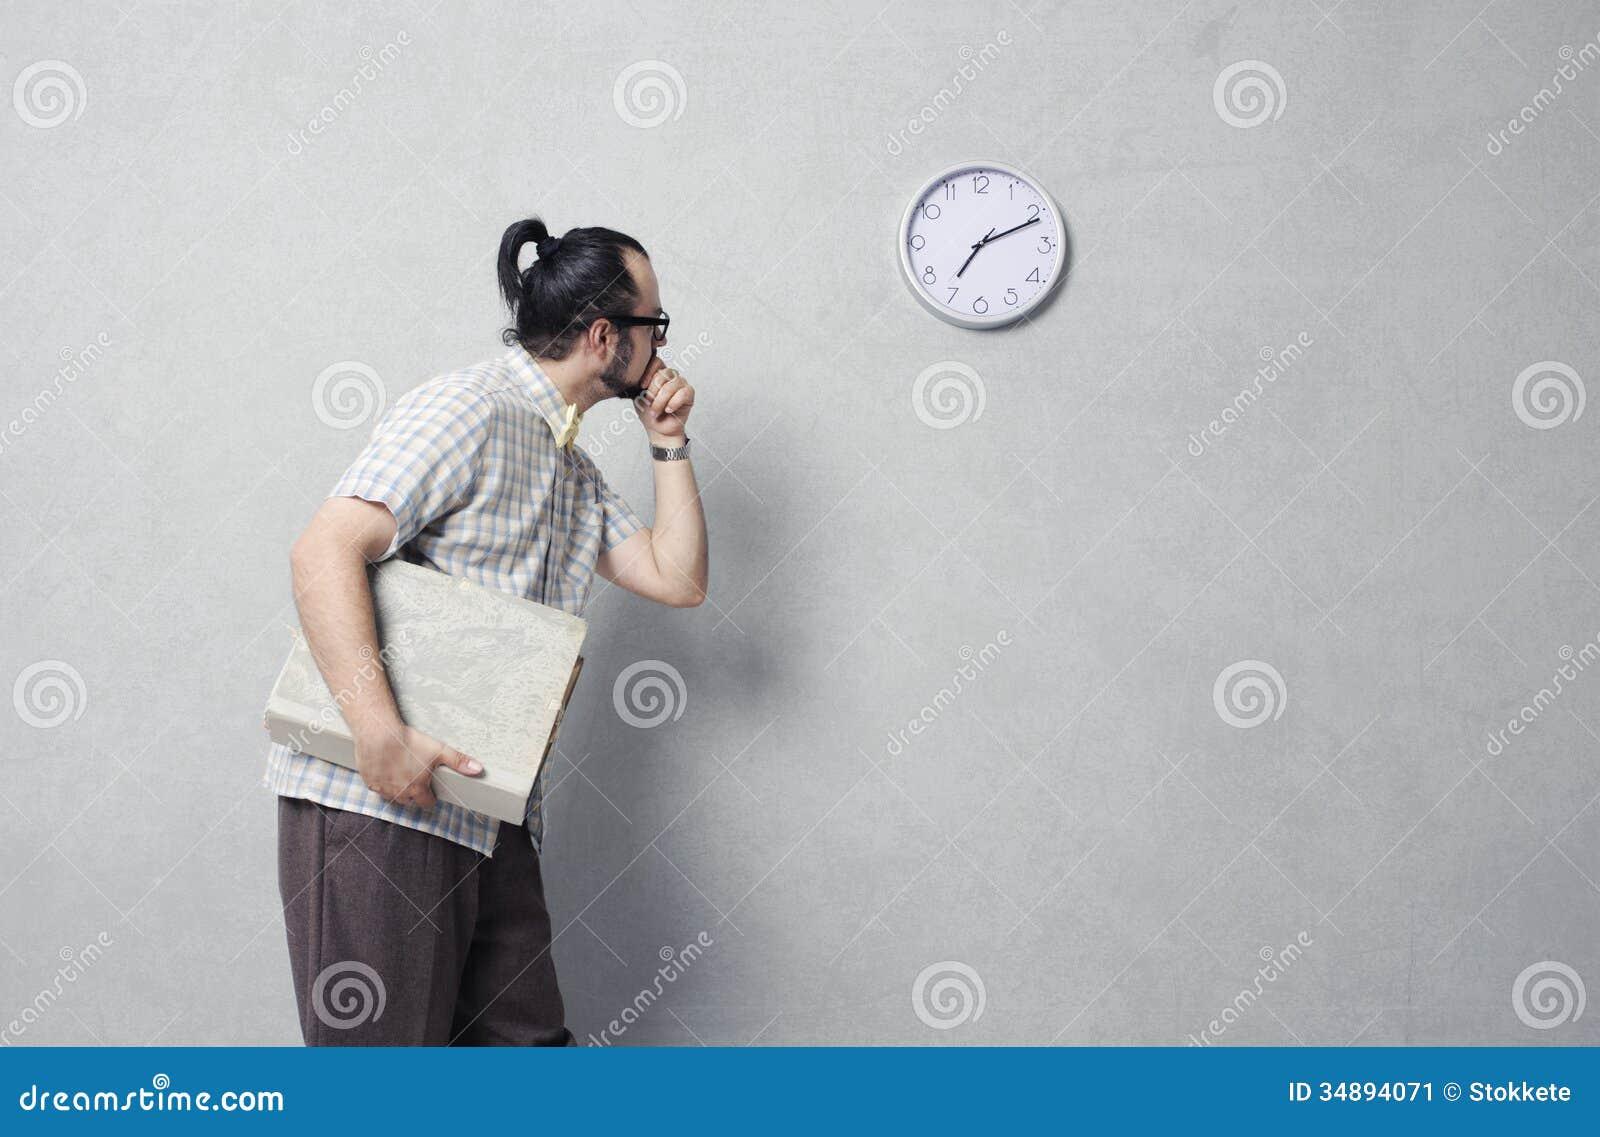 last job seeker waiting interview stock image image  last job seeker waiting interview